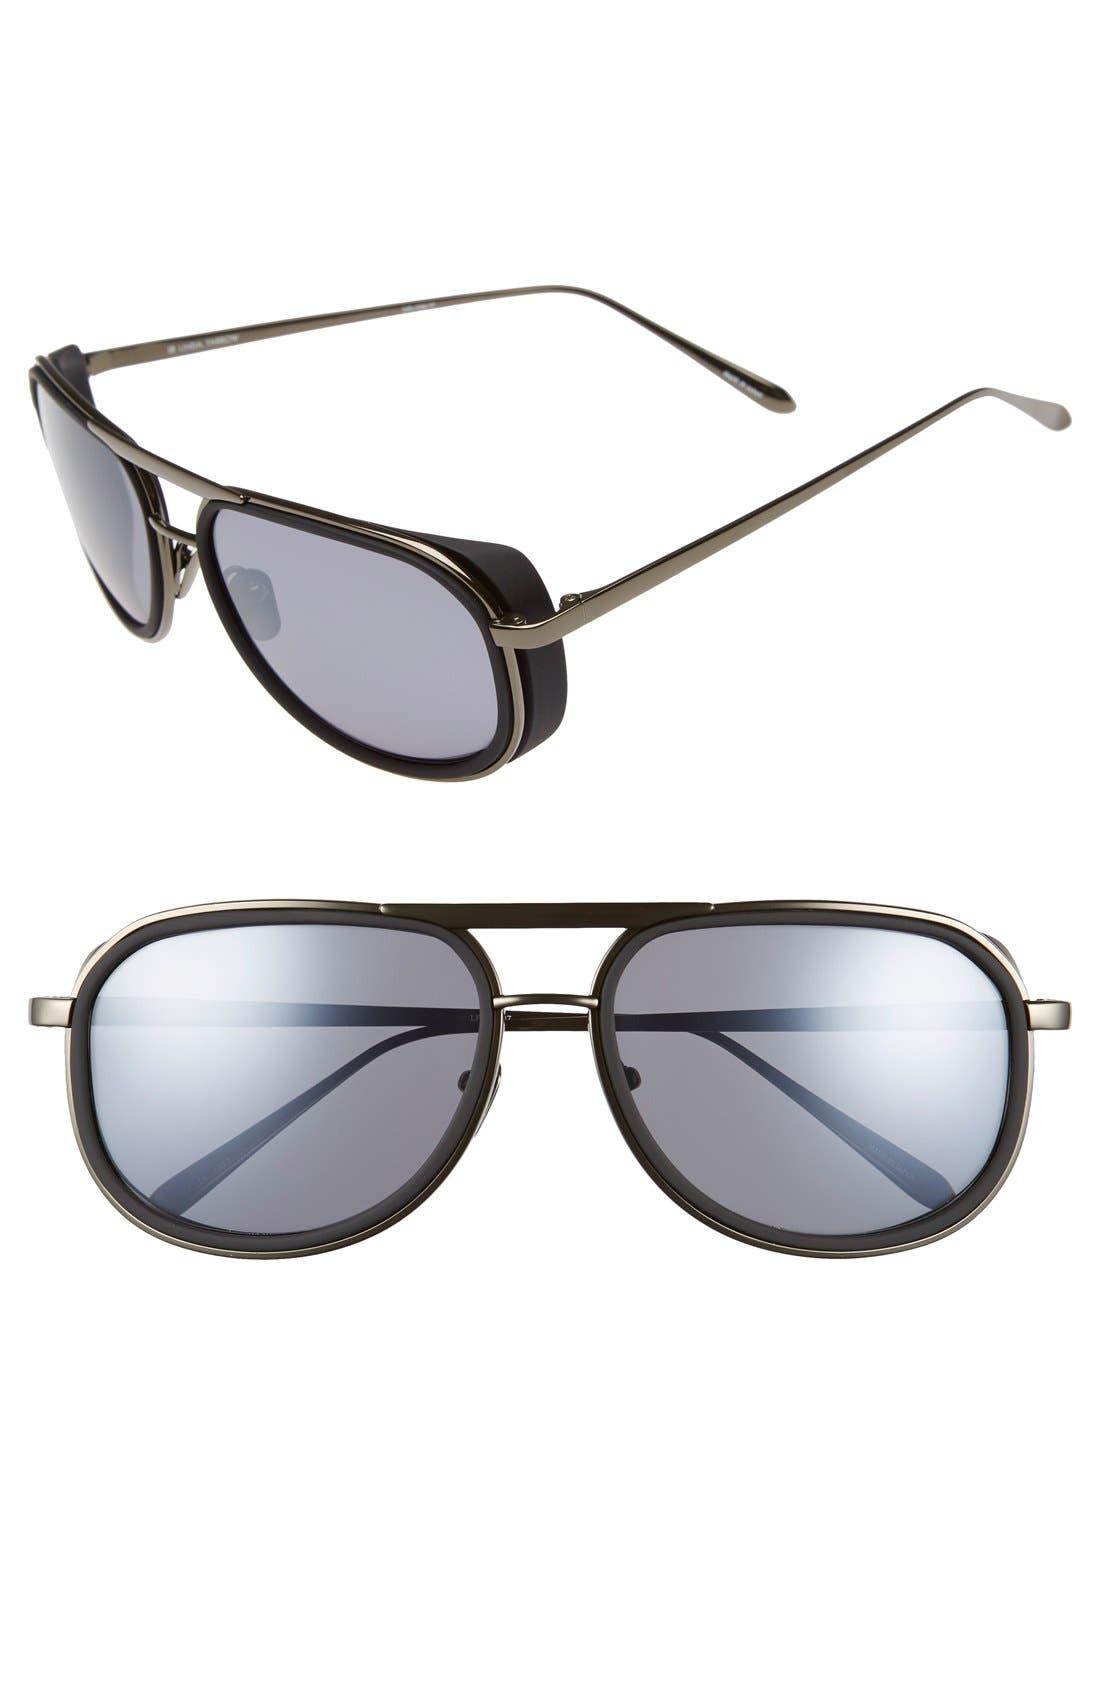 58mm Sunglasses,                             Main thumbnail 1, color,                             Black/ Matte Silver